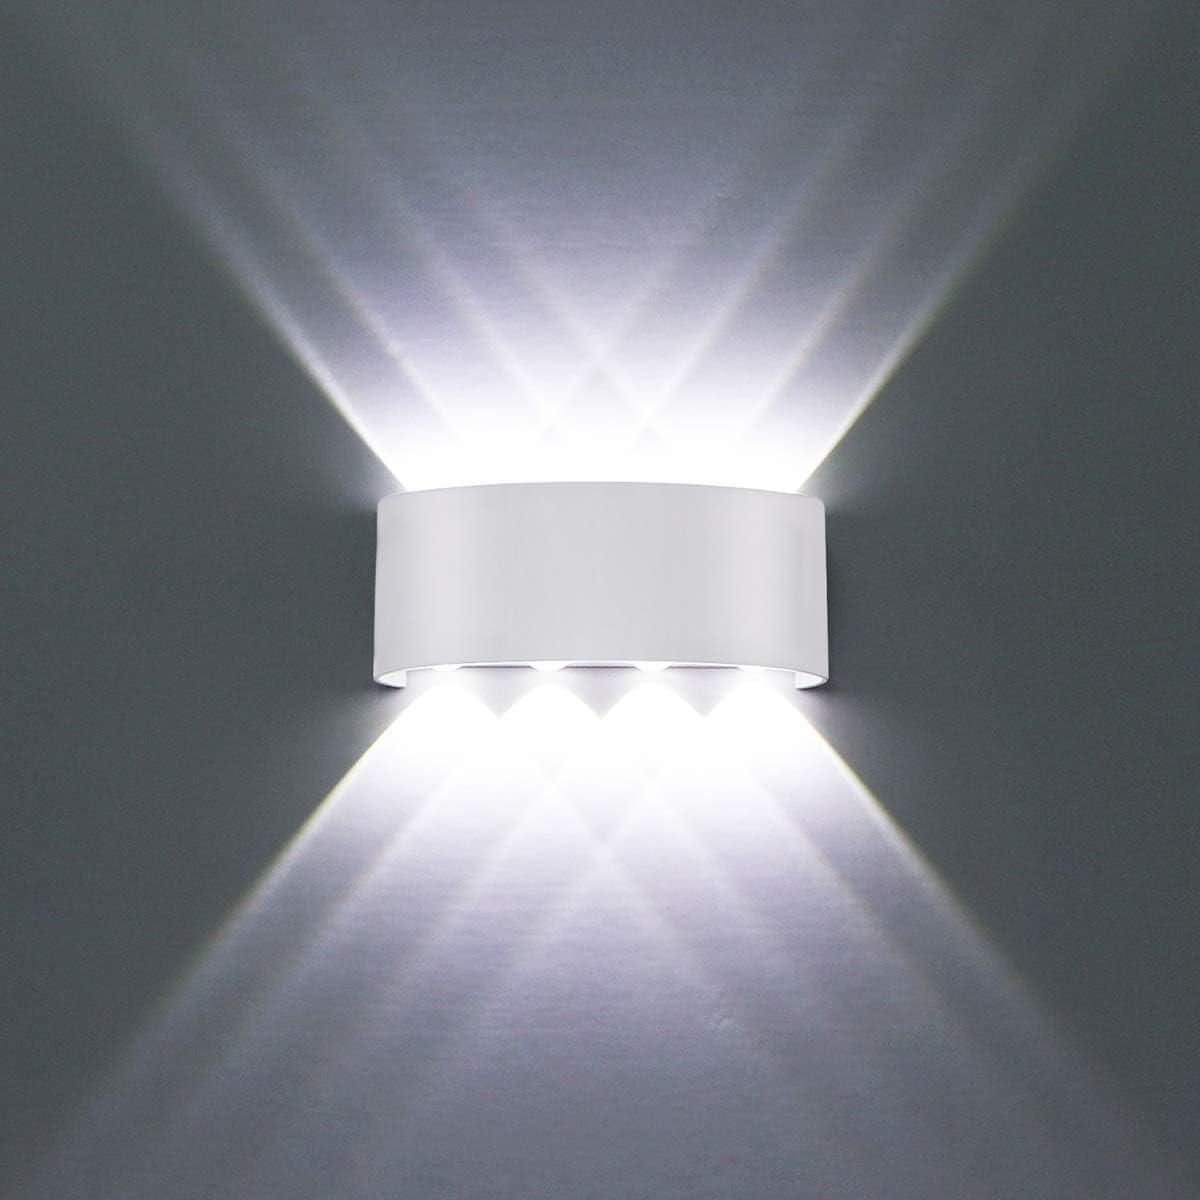 Iluminaci/ón Para El Hogar Lustre Luminaria Apliques De Luz Para Cabecera Luces Led Para Dormitorio Apliques Para Habitaci/ón De Ni/ños L/ámparas De Pared Modernas